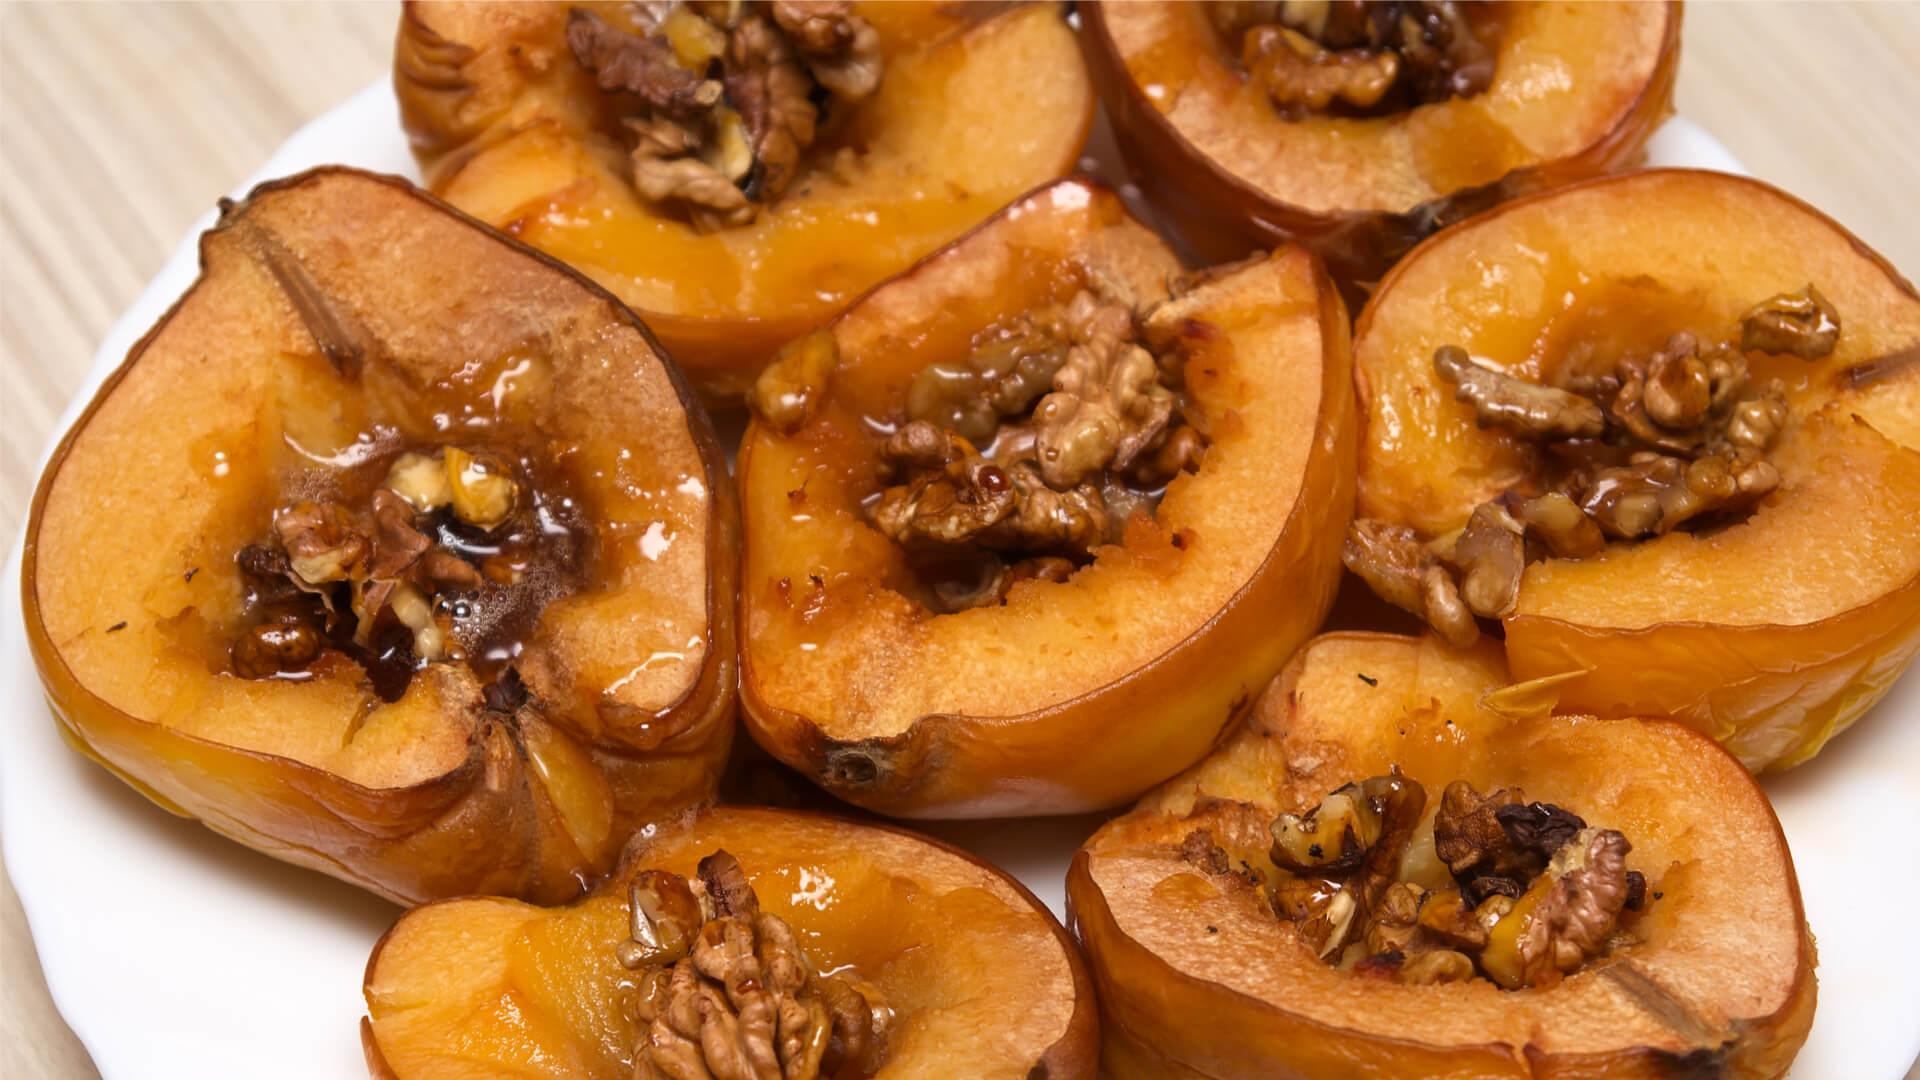 Baked quince autumn desert mallorca